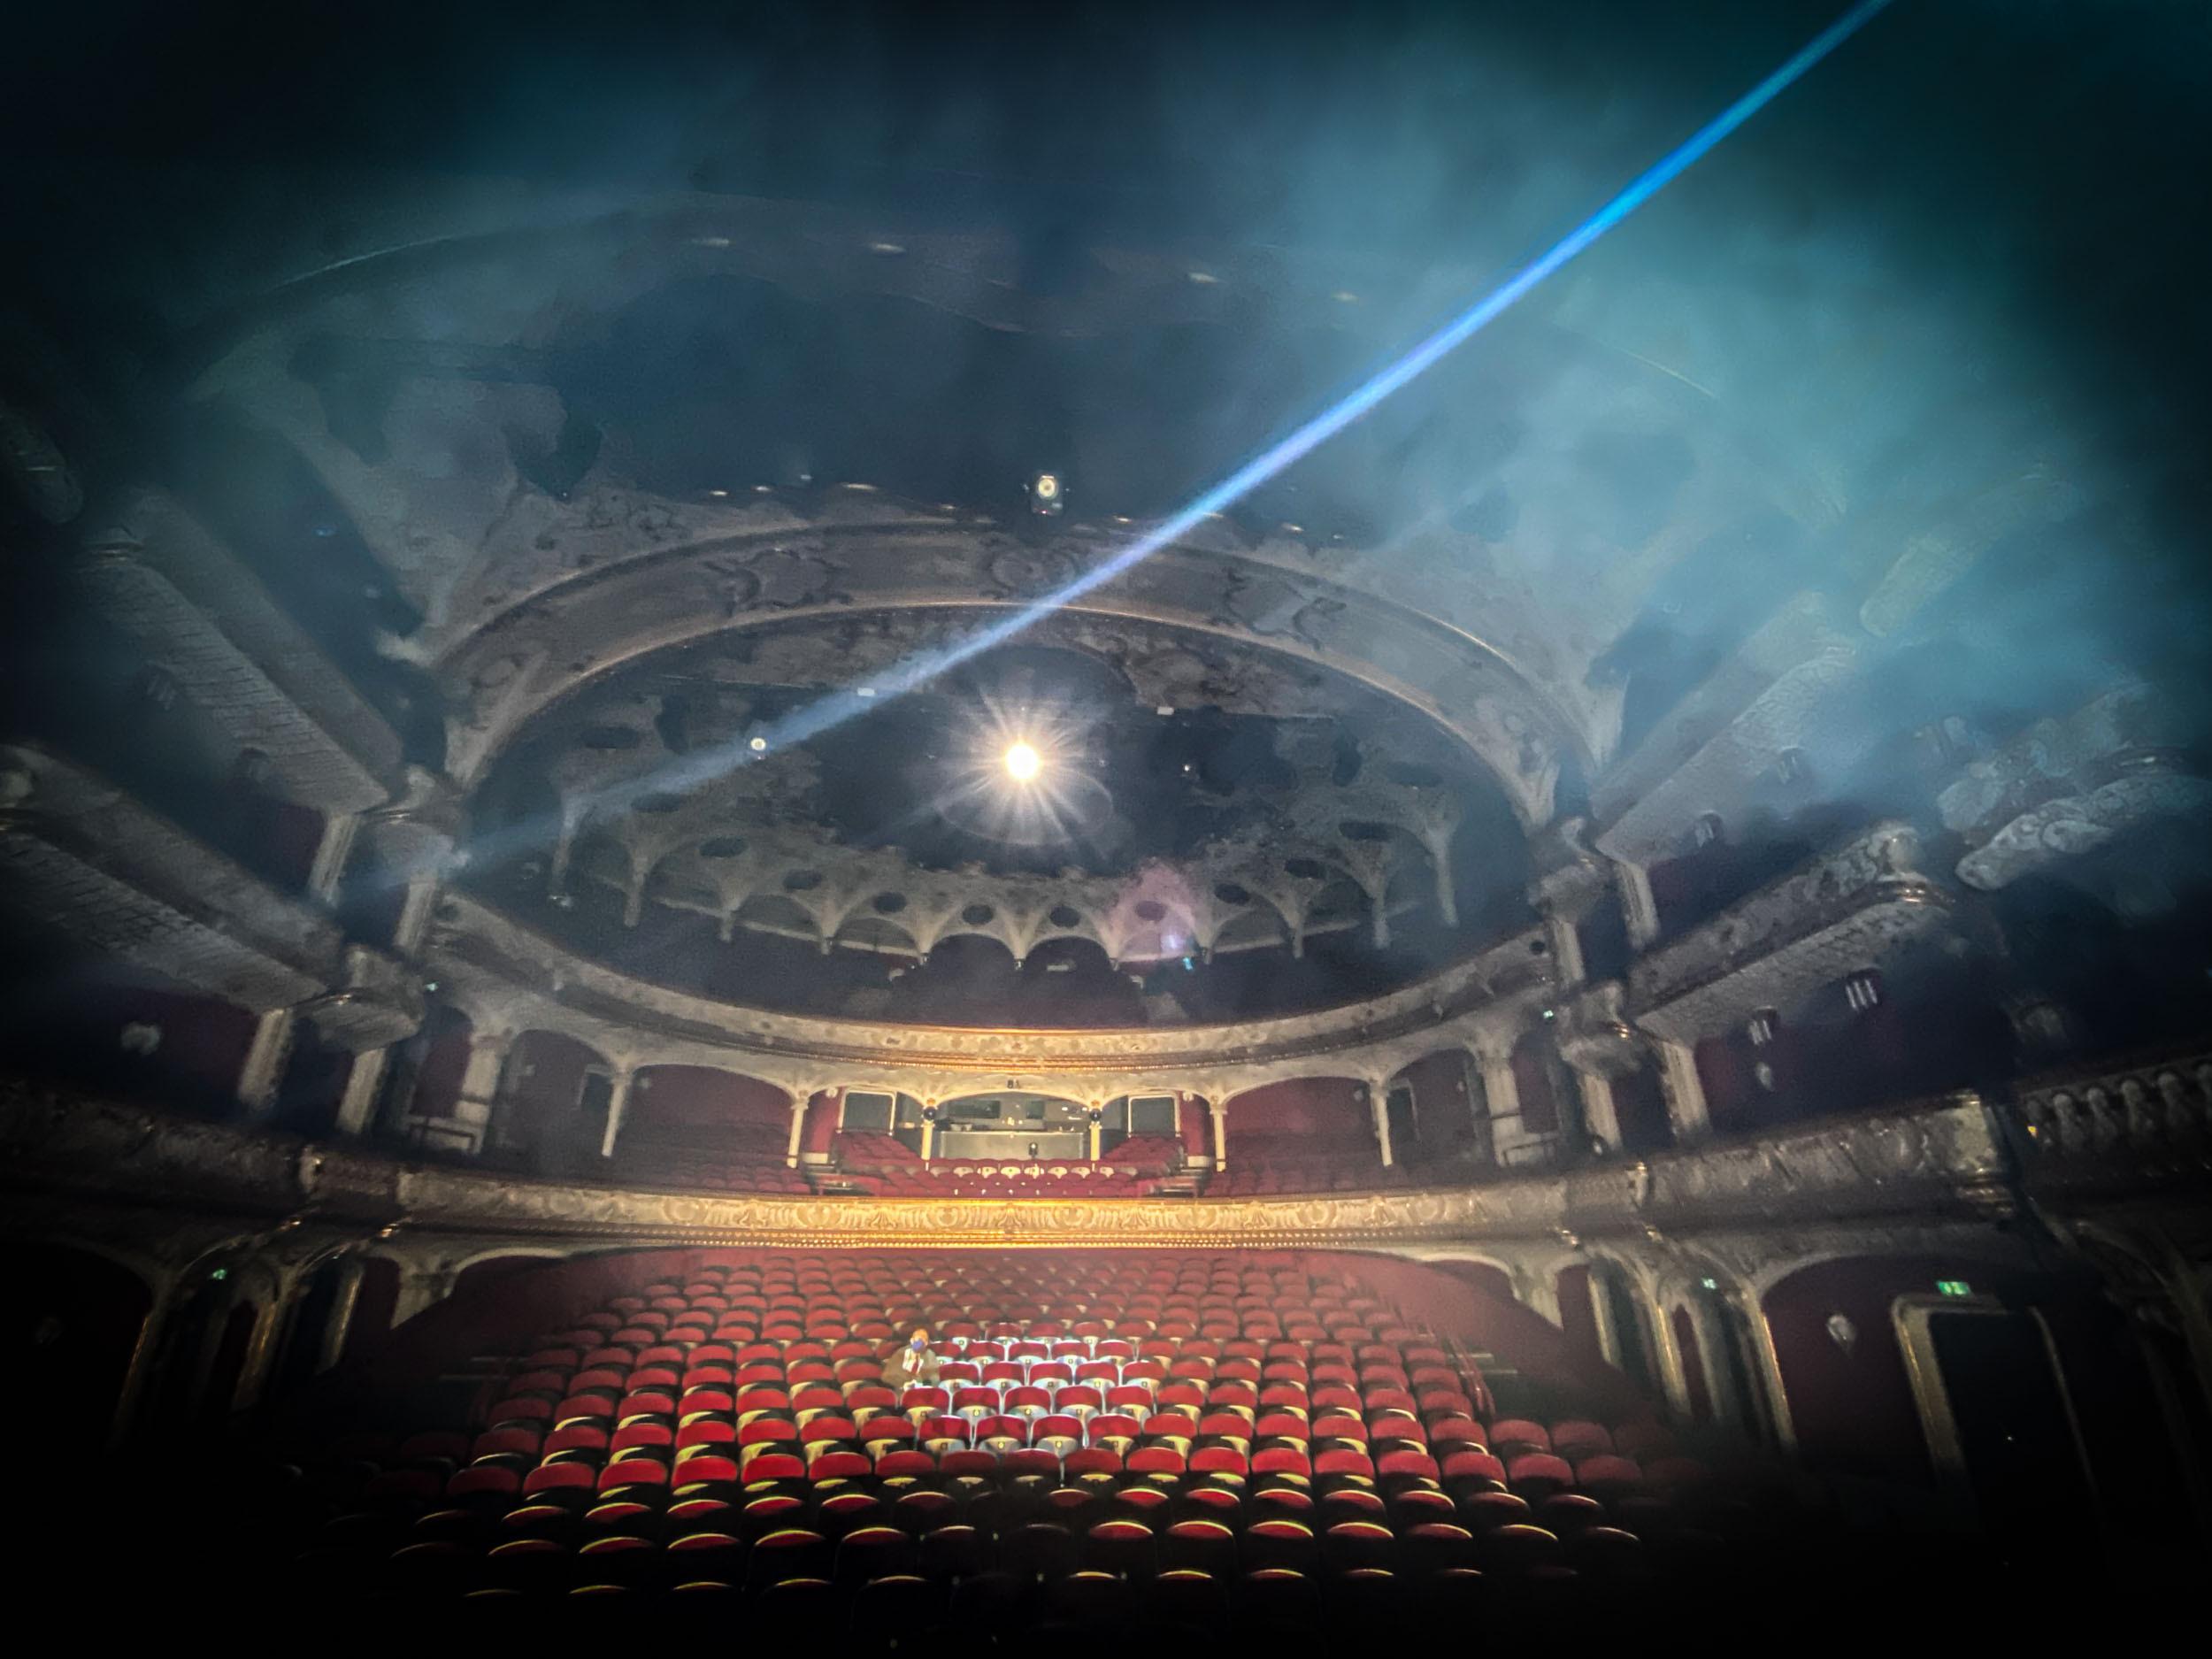 eSeL Foto: Rimini Protokoll - Black Box (Volkstheater Wien, erneut ab 3.4., Vorverkauf ab 25.3.)